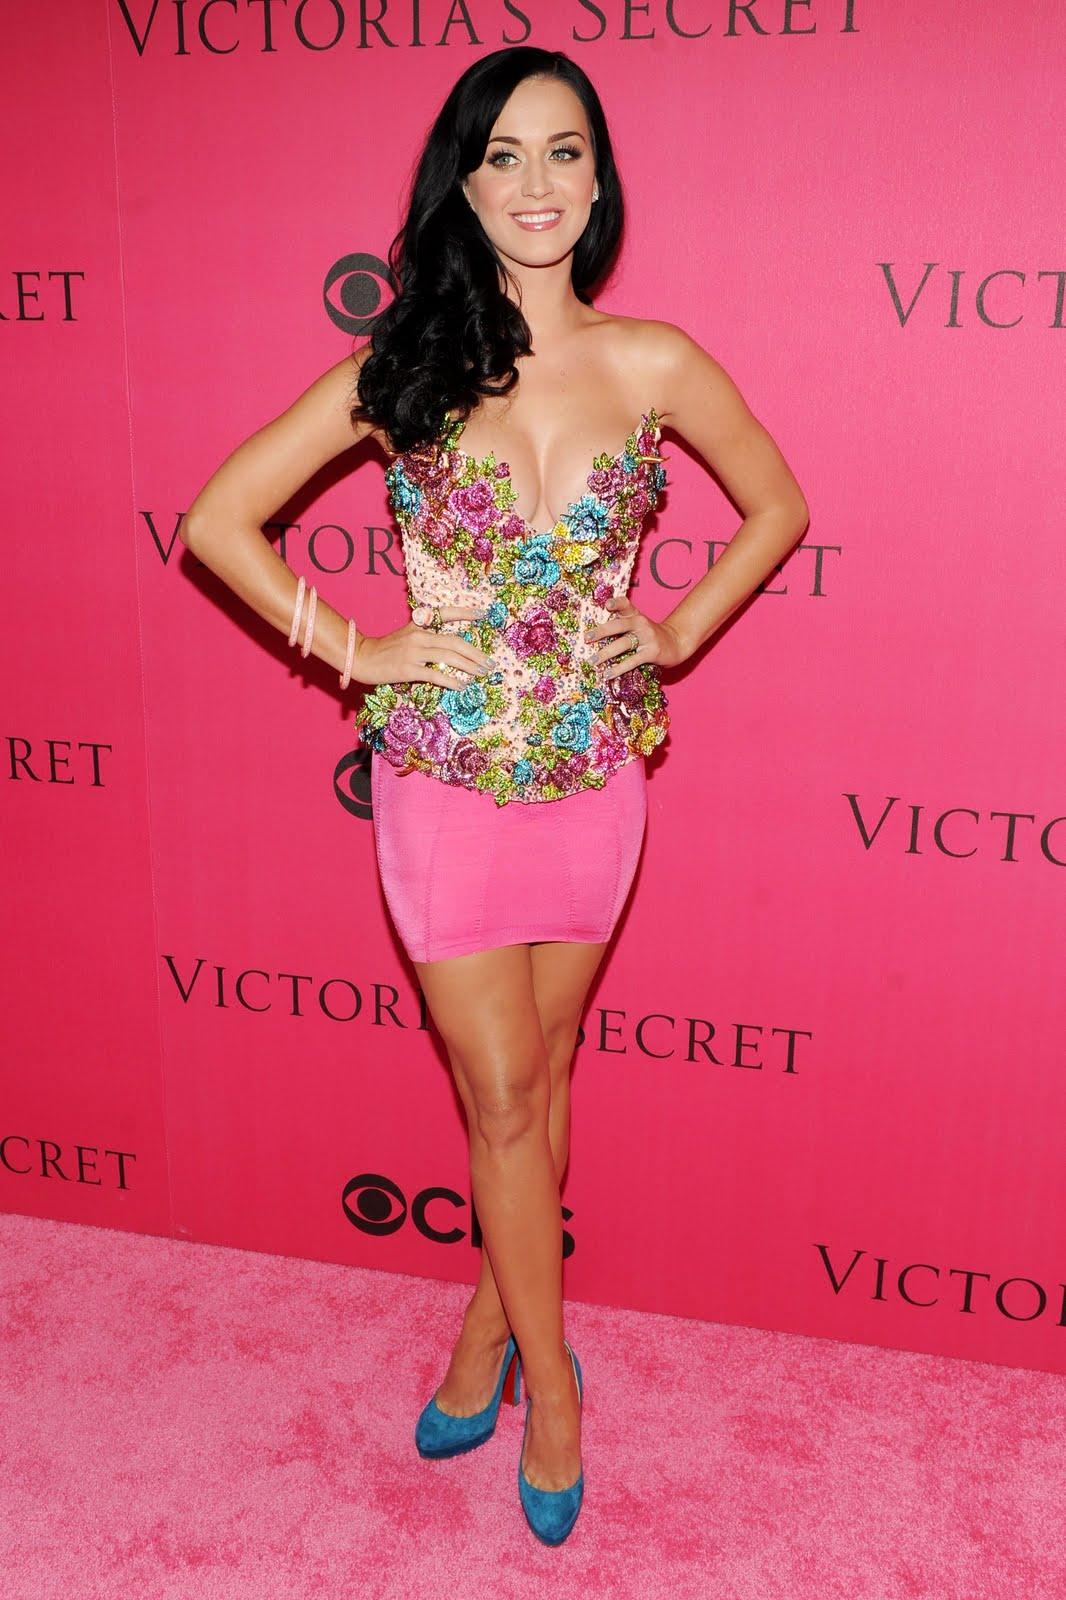 http://3.bp.blogspot.com/_LTi0R8IRkIs/TQFKufoiW-I/AAAAAAAAFMk/Rpp5xMlLIyE/s1600/Katy_Perry_2010_Victorias_Secret_Fashion_Show_012_122_113lo.jpg